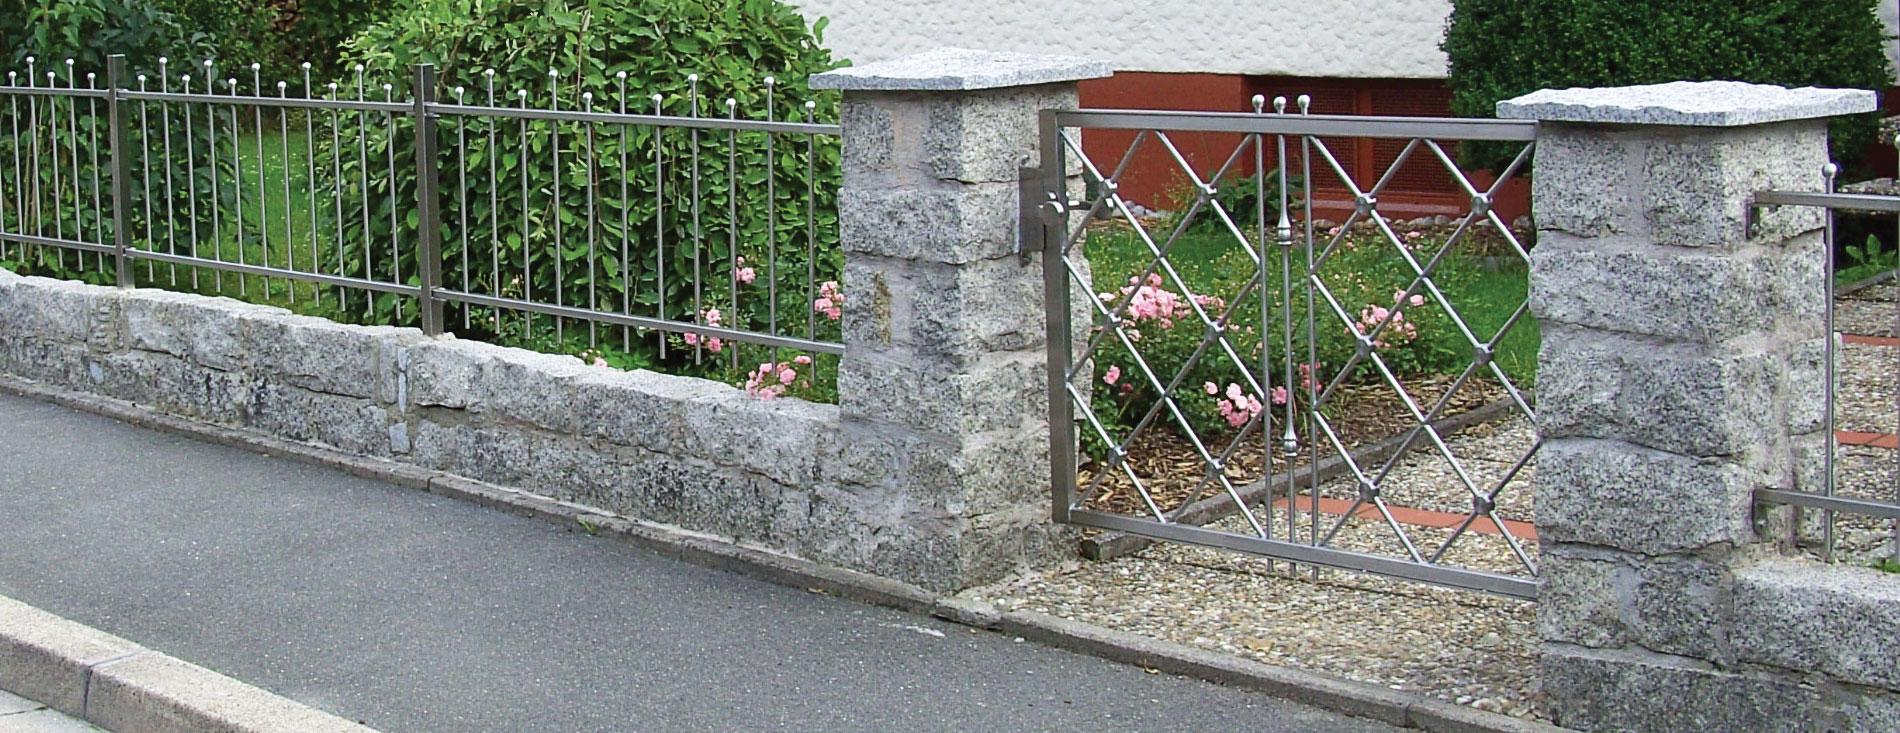 fence house design gartenzaun lochblech. Black Bedroom Furniture Sets. Home Design Ideas